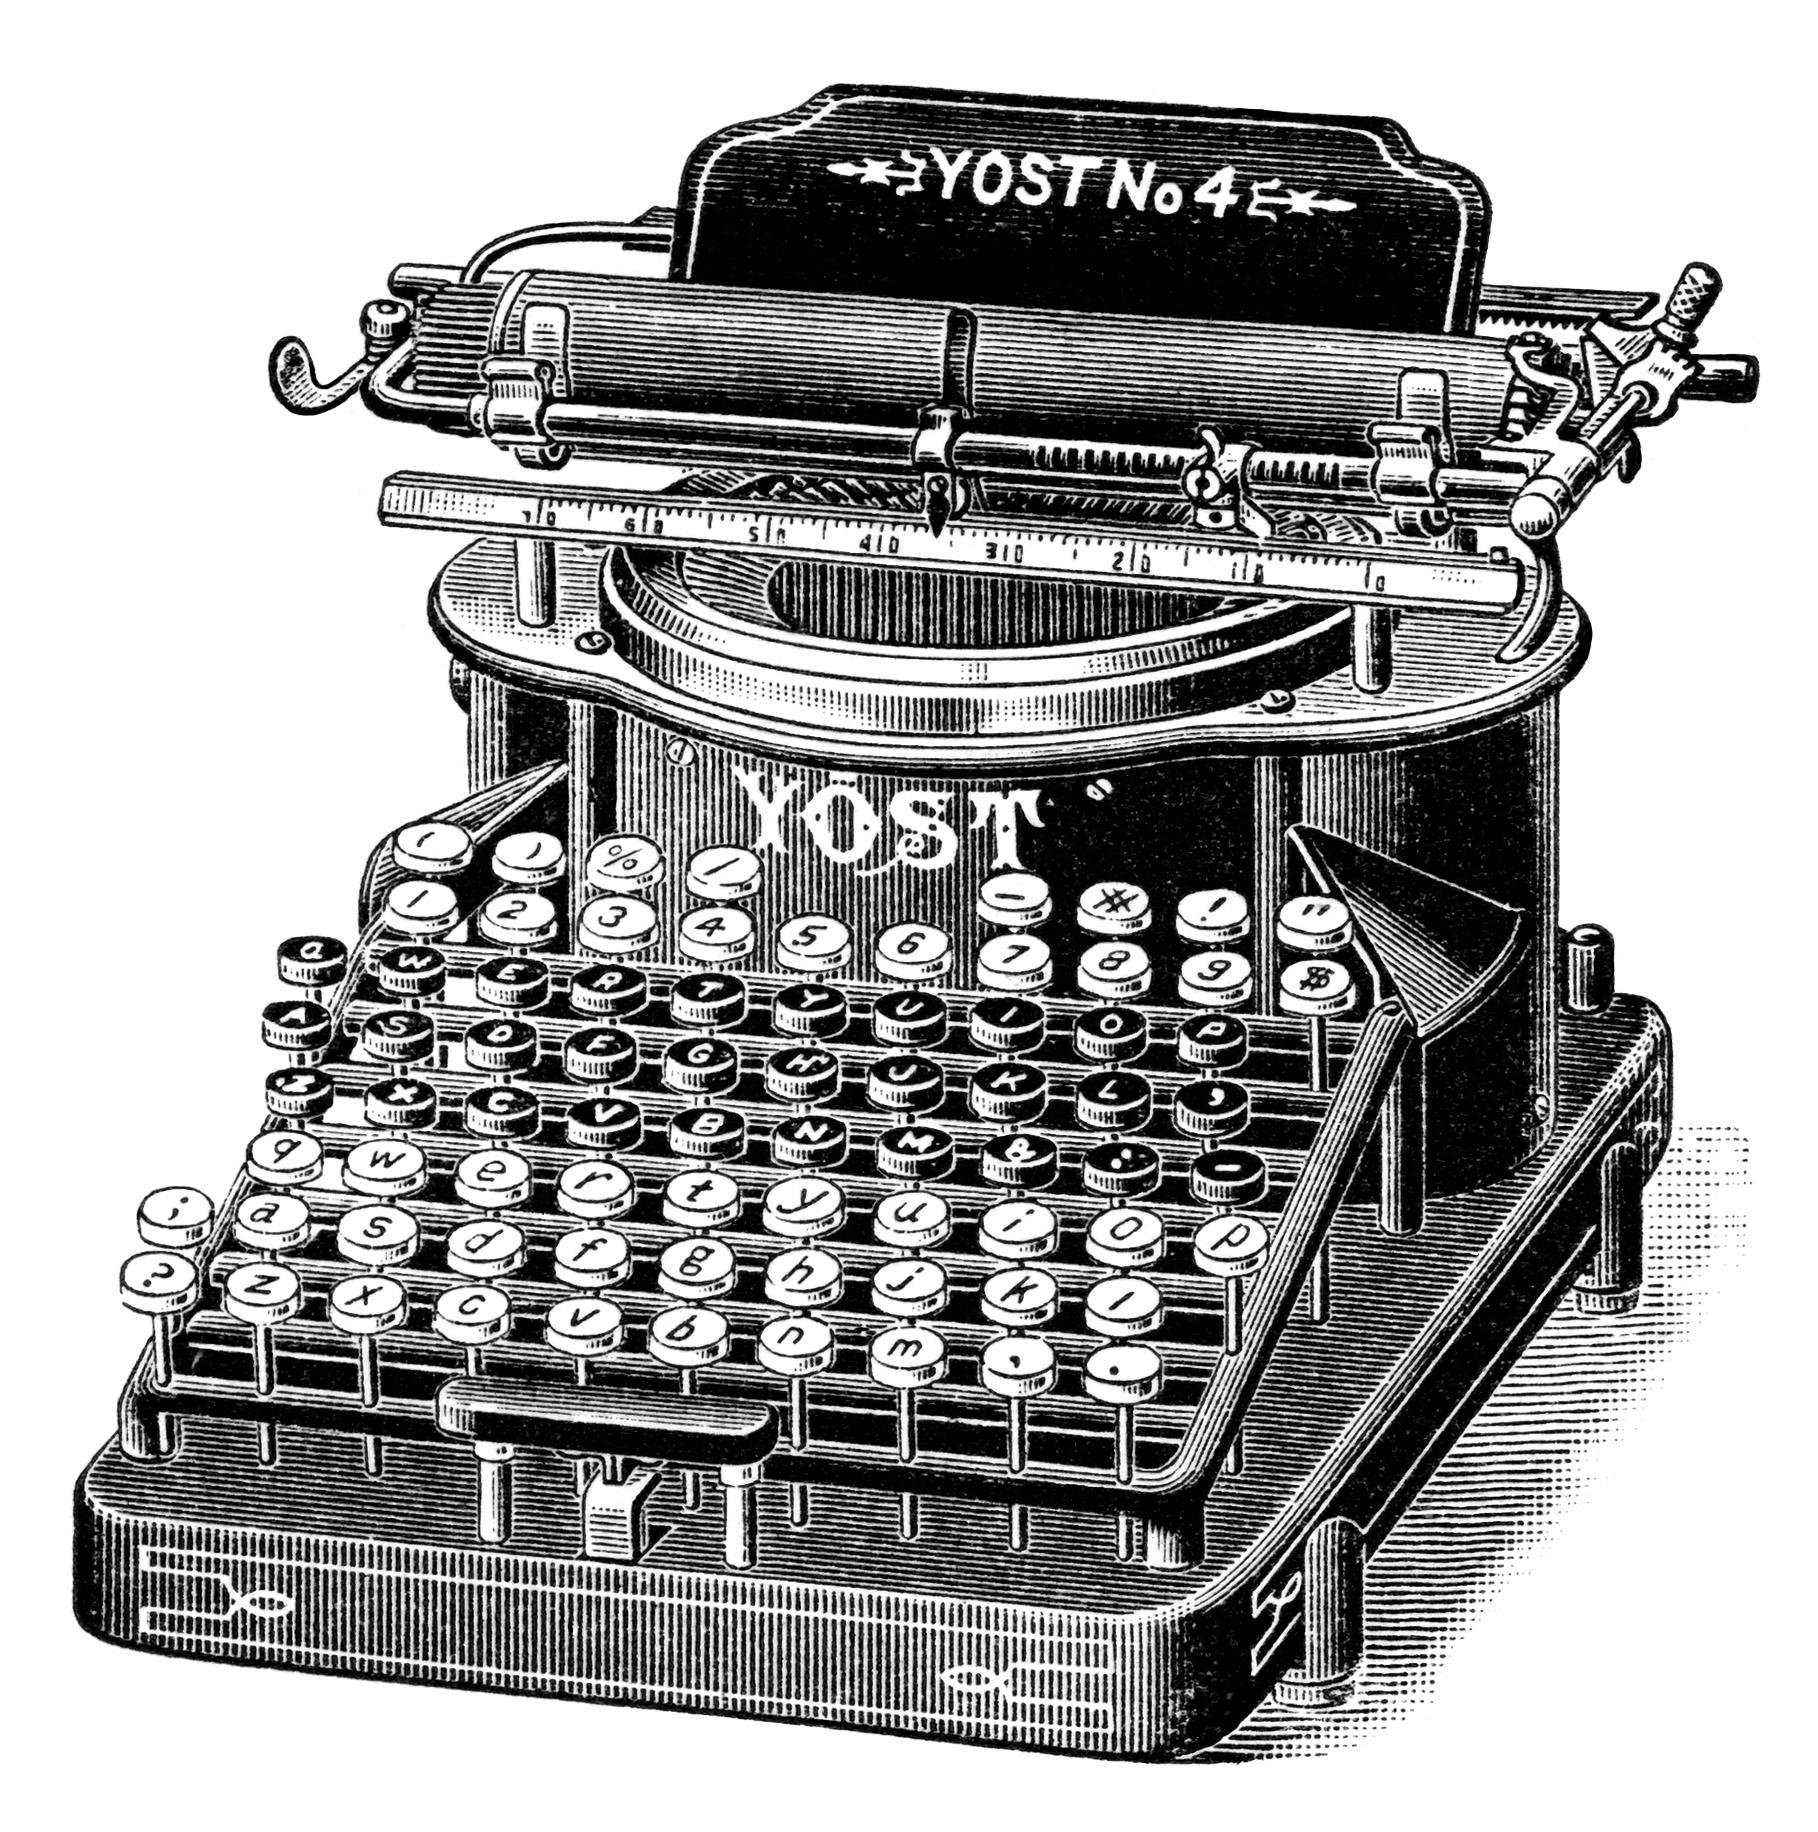 Typewriter clipart old school 1 clipart teachers study Free